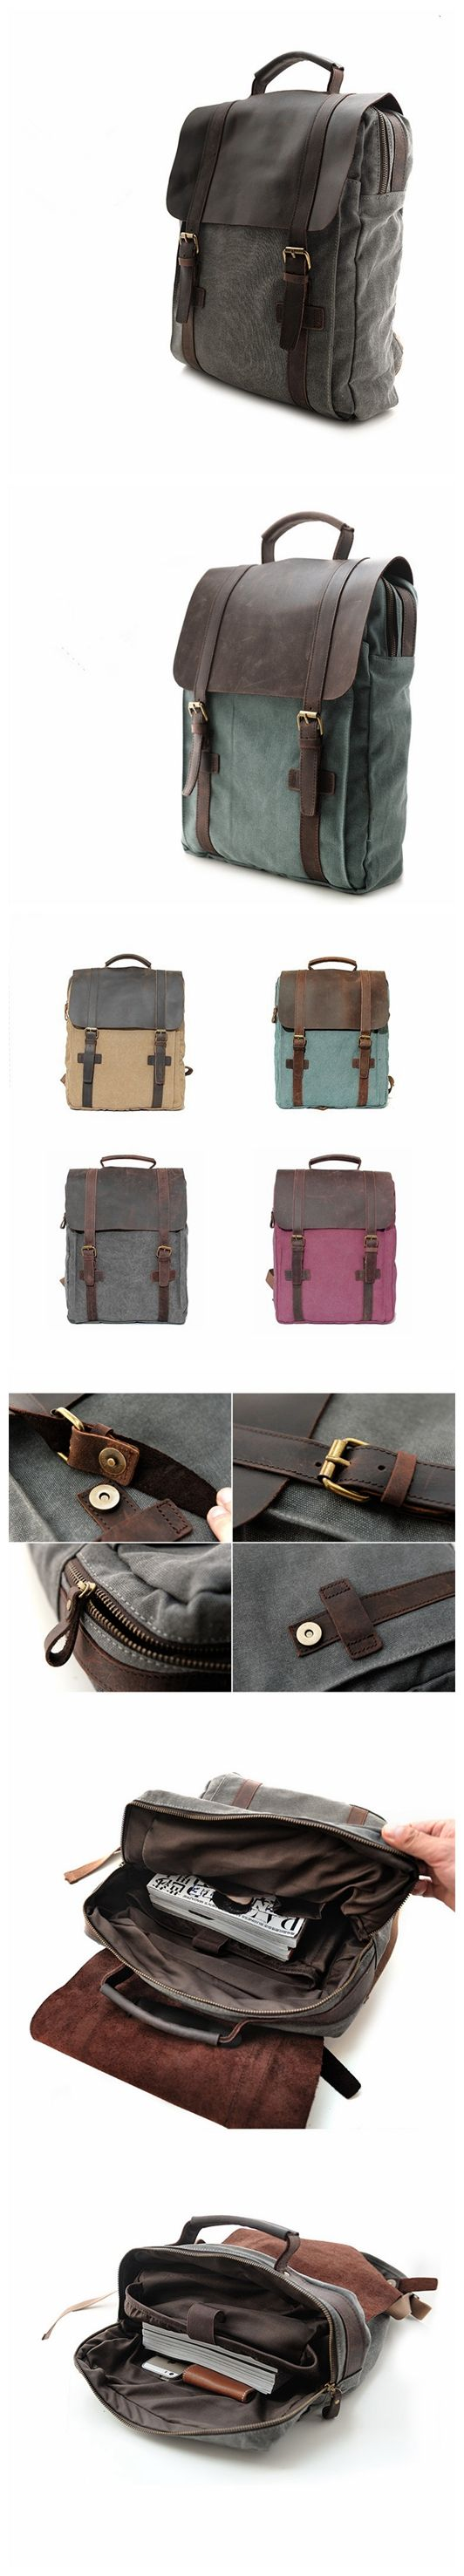 Hot Sale Canvas Leather Backpack, Waxed Canvas Shoulder Bag School Backpack